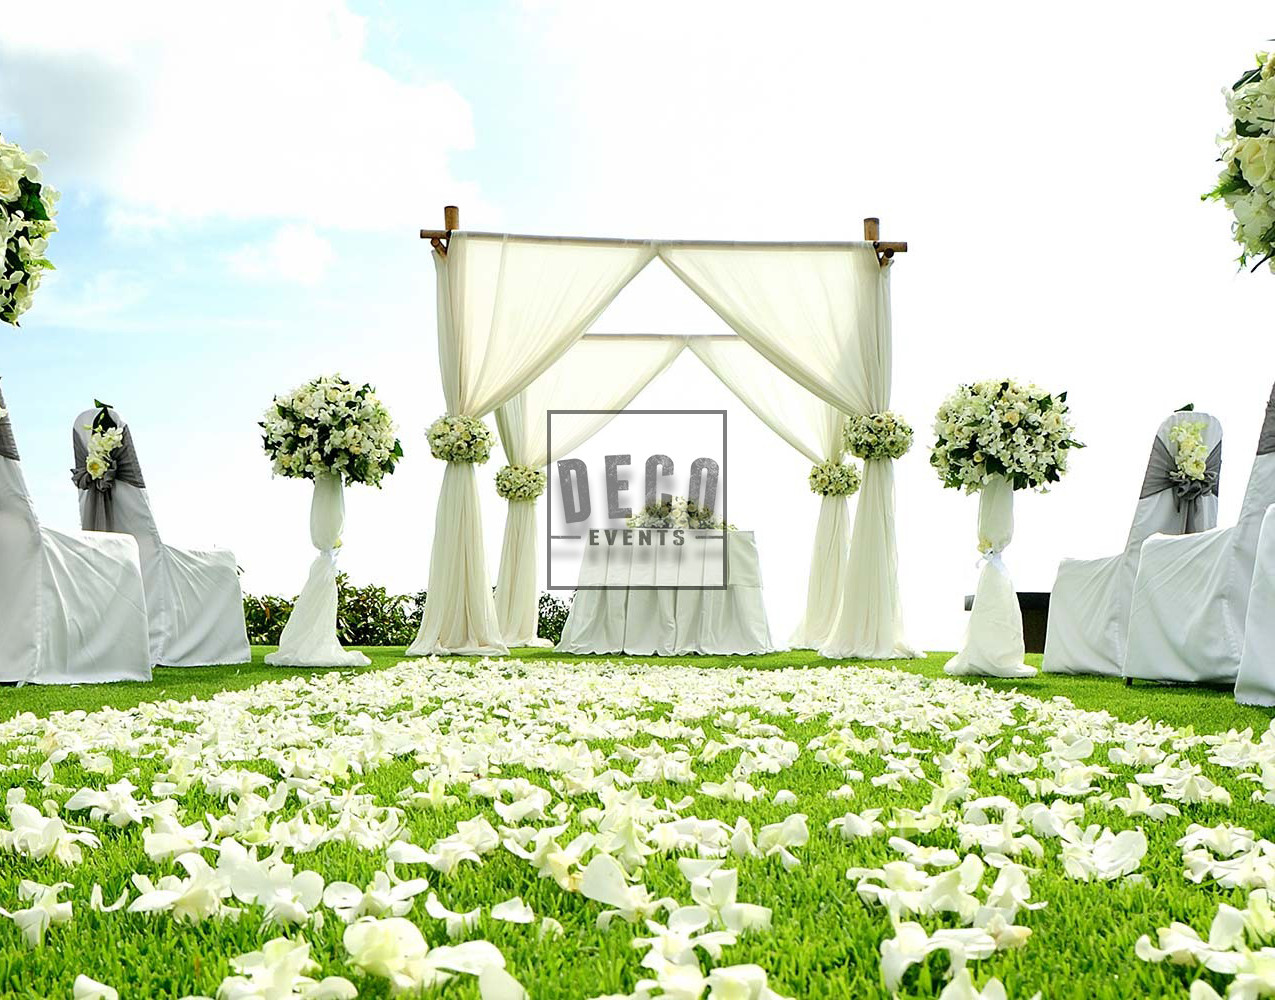 DECO_Events_decoration_ceremonie_religieuse_laique_mariage_region_paca_1